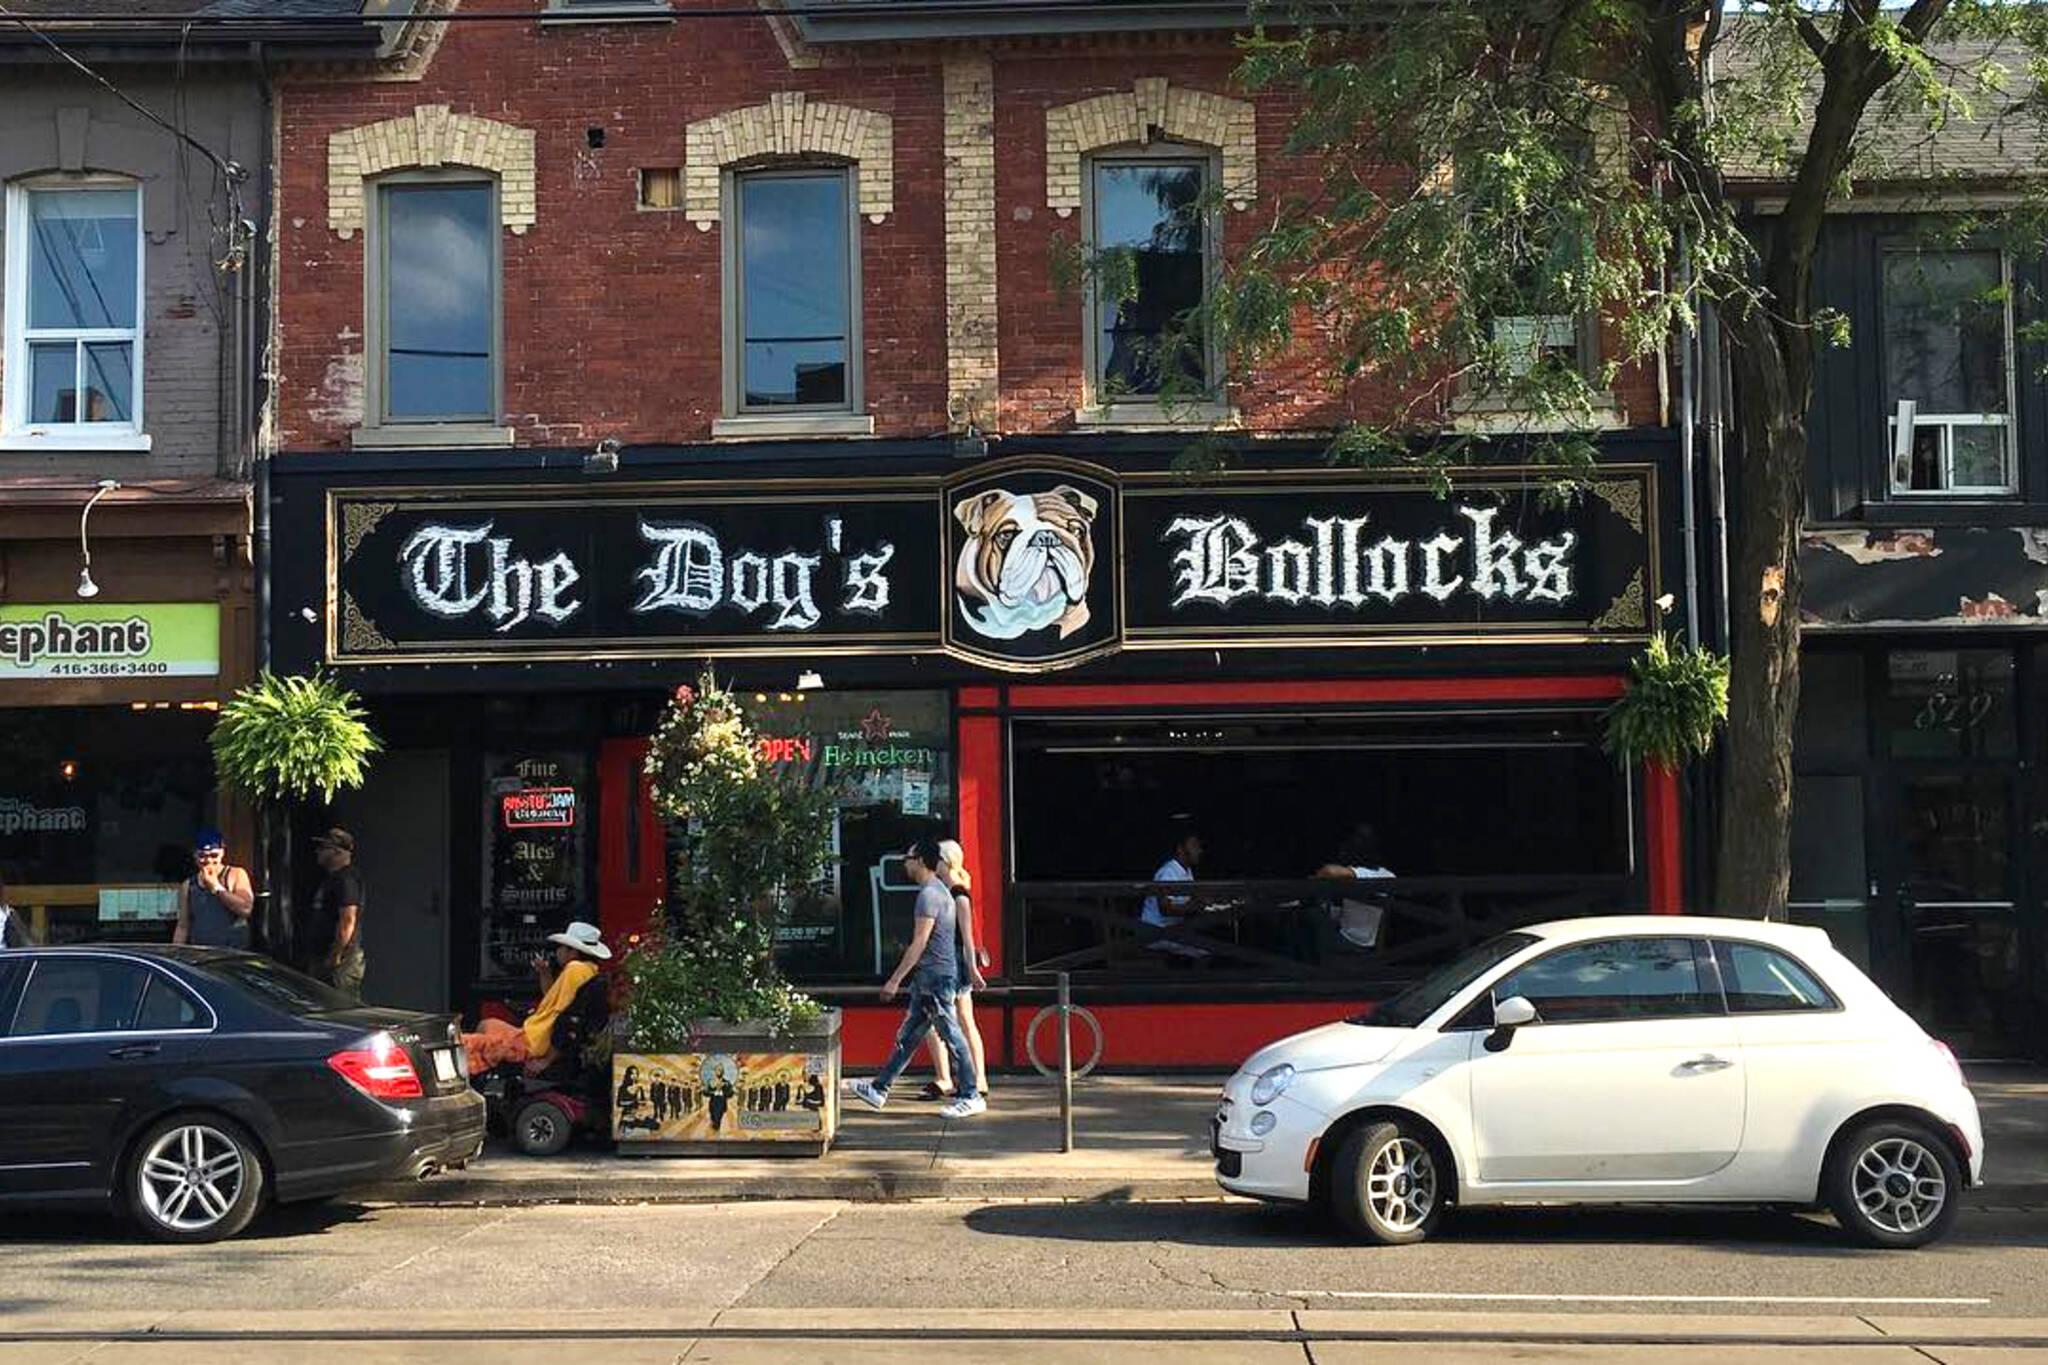 Dogs Bollocks Toronto